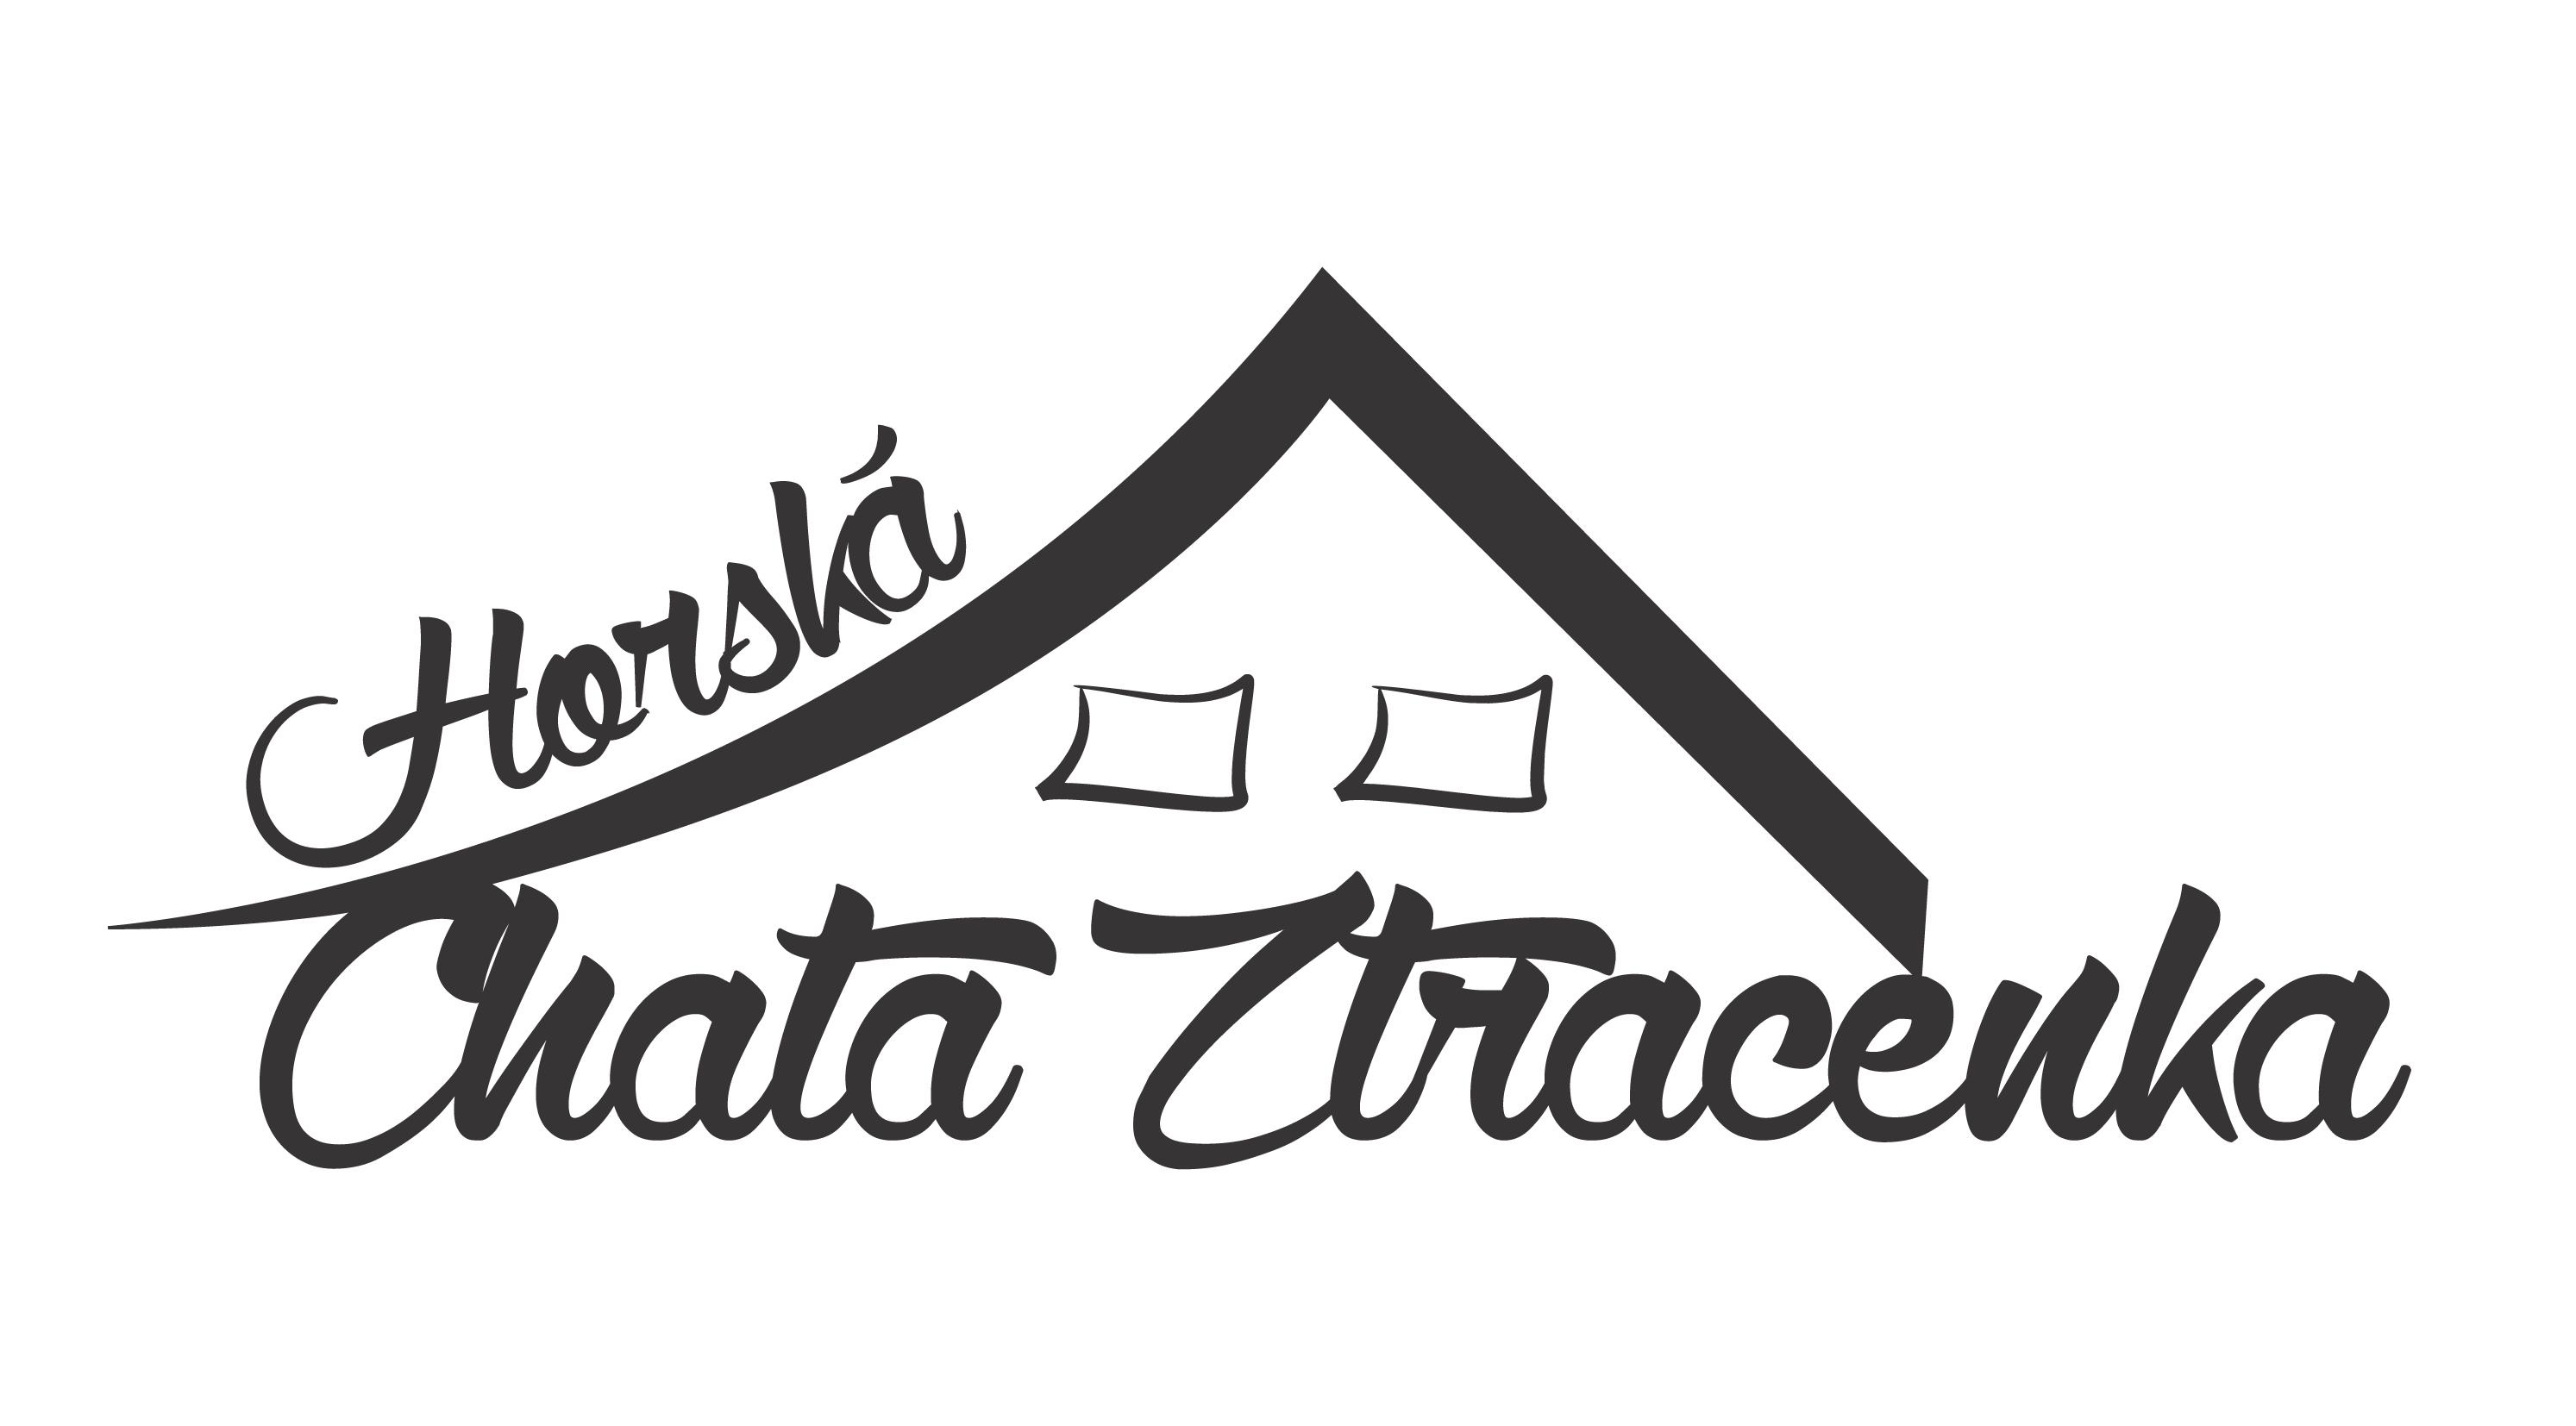 Logo Chata Ztracenka